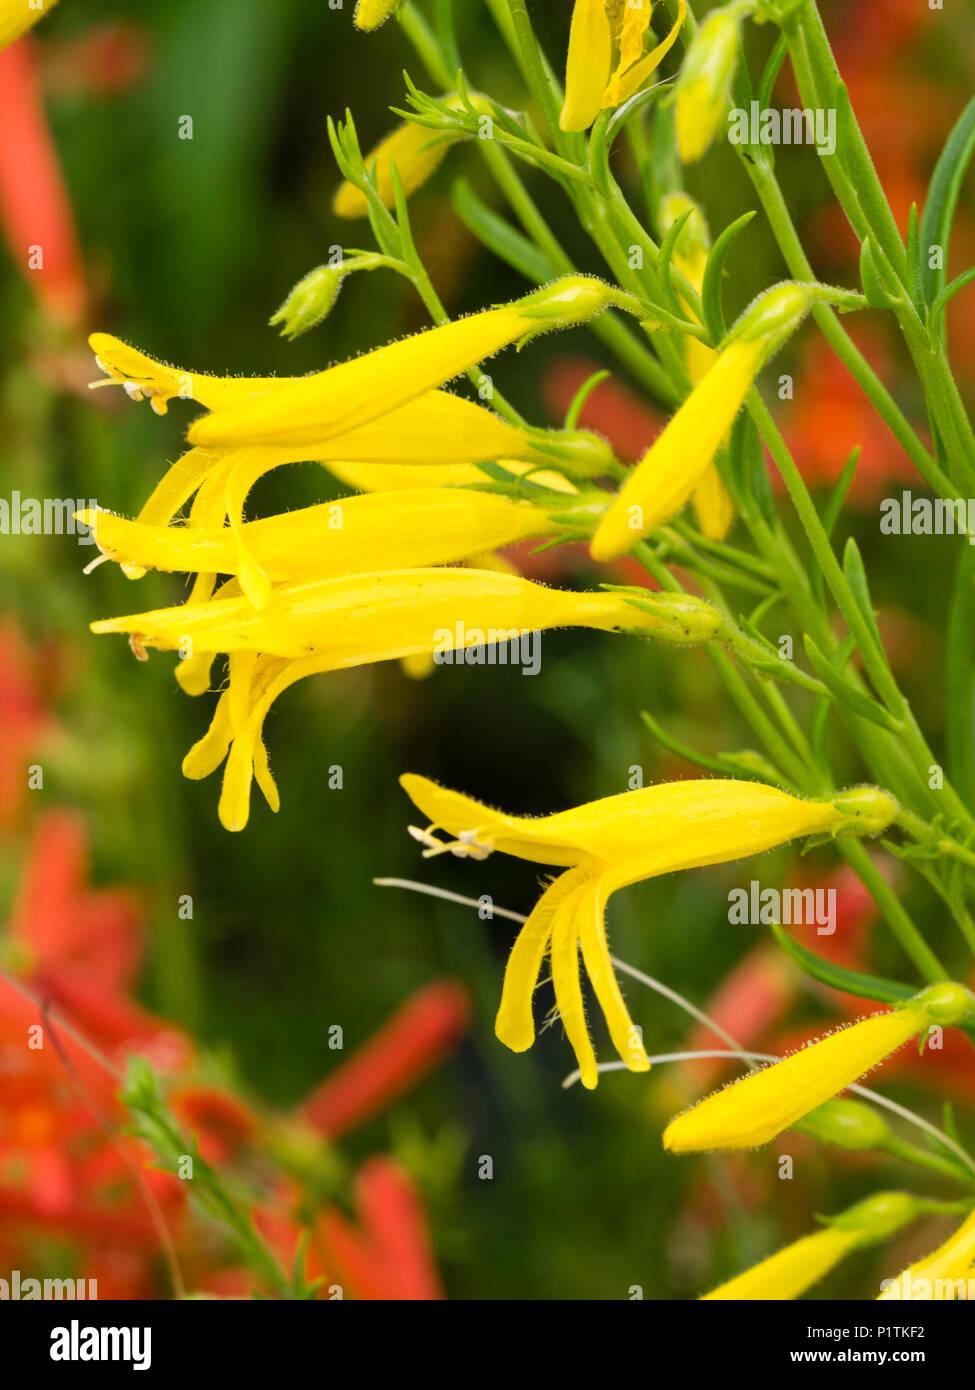 Yellow tubular flowers stock photos yellow tubular flowers stock yellow tubular flowers of the dwarf summer flowering sub shrub penstemon pinifolius mersea mightylinksfo